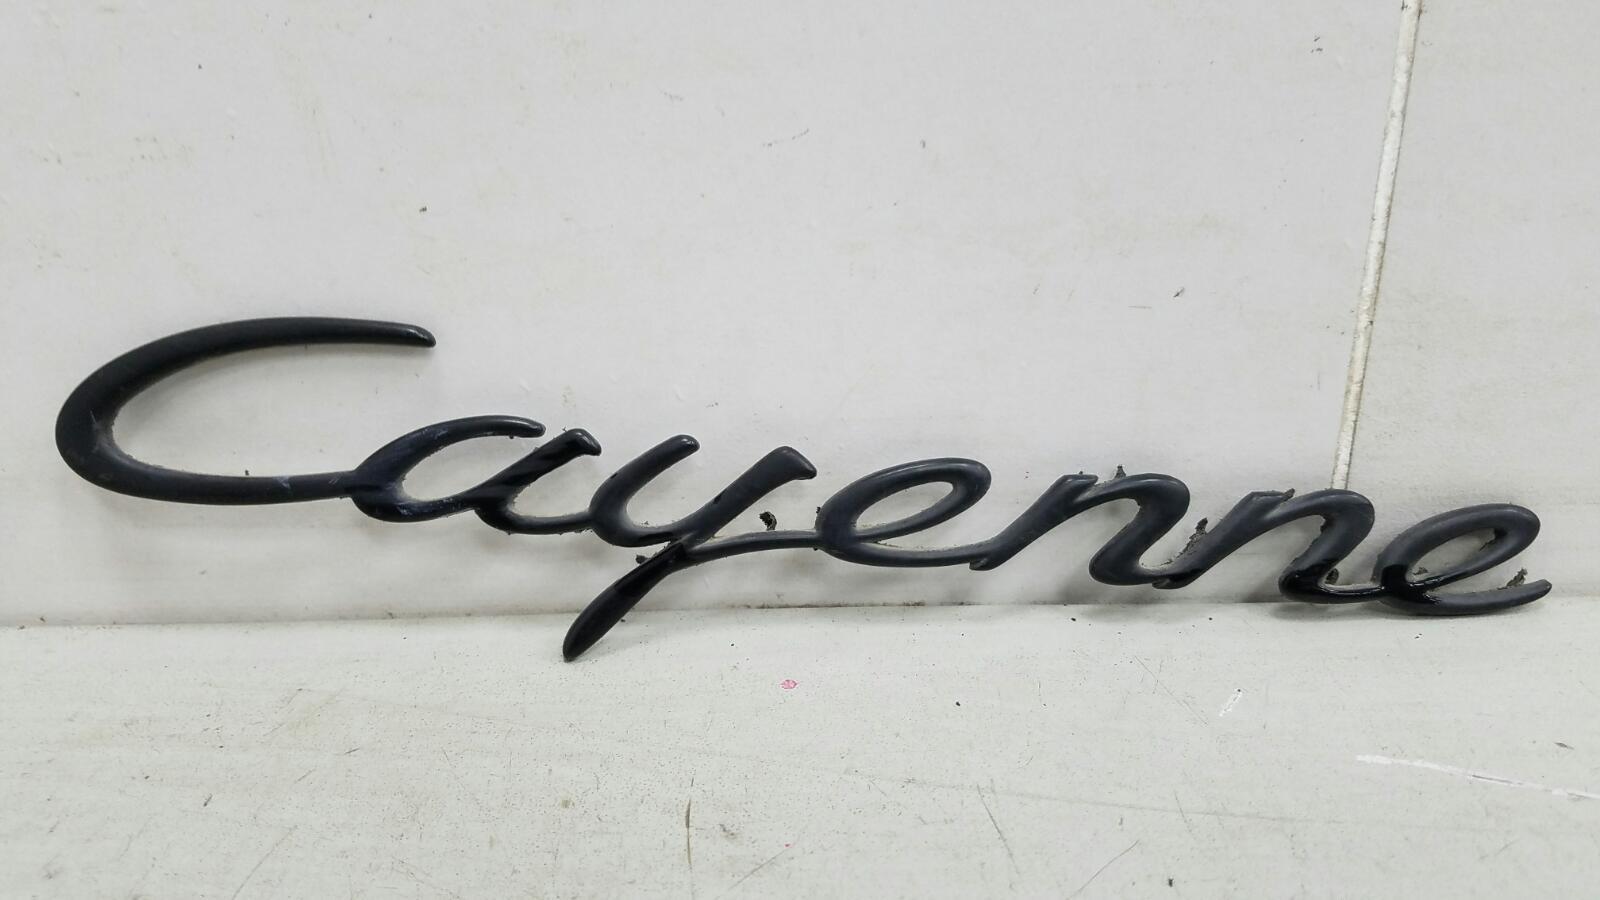 Эмблема Porshe Cayenne 955 BMV M02.2Y 3.2Л 2005